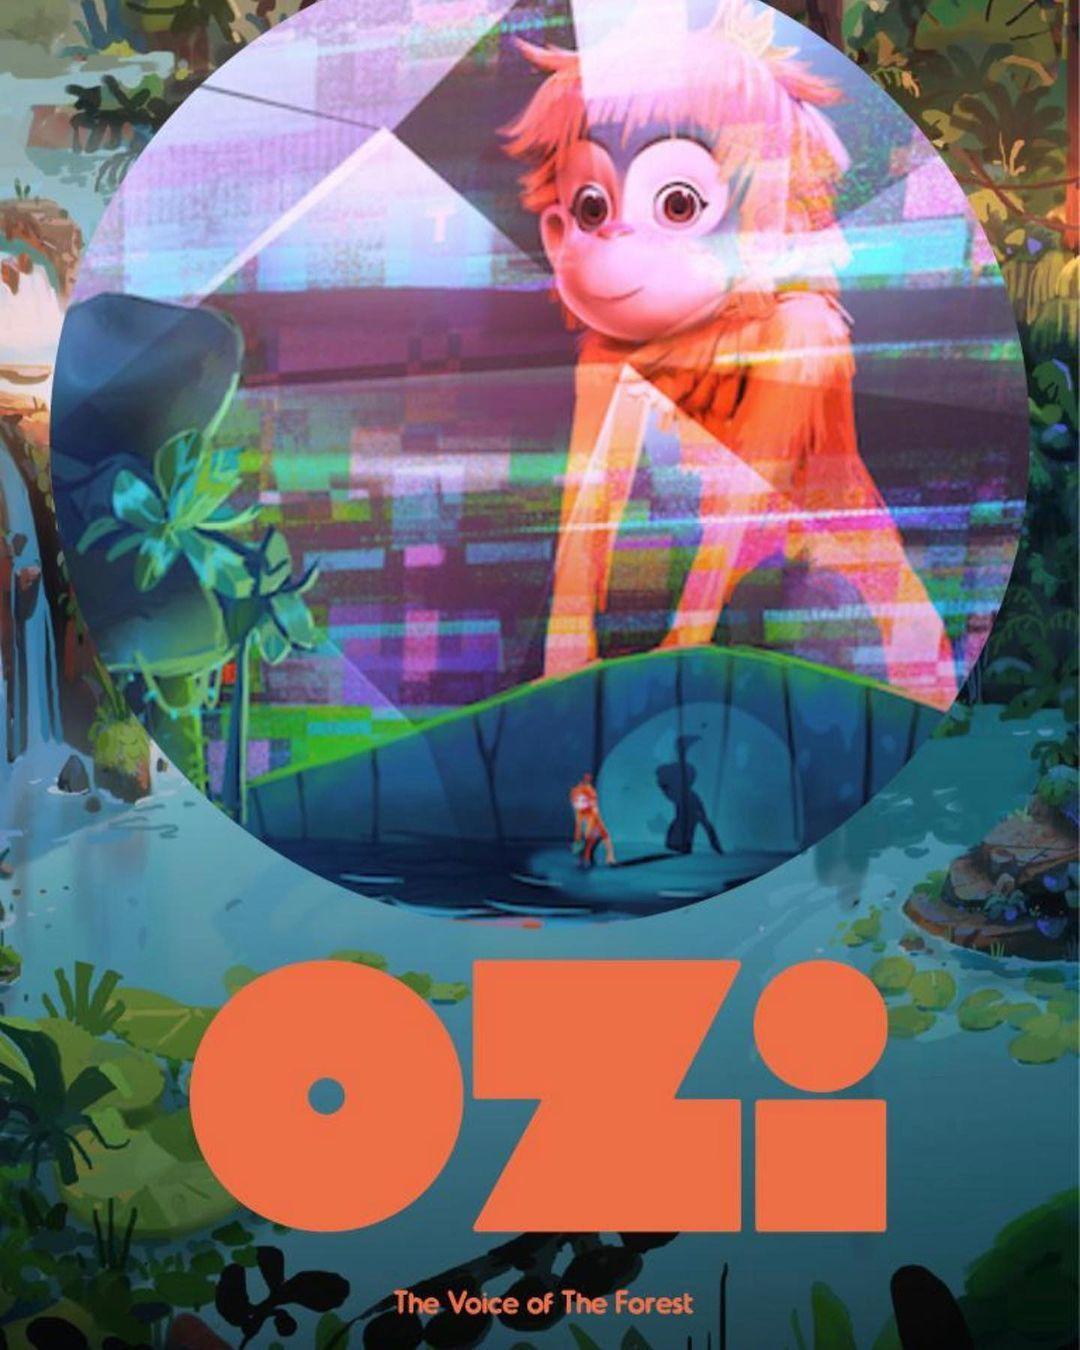 Marissa Anita Jadi Pengisi Suara, Ini 5 Fakta Film Animasi 'Ozi'